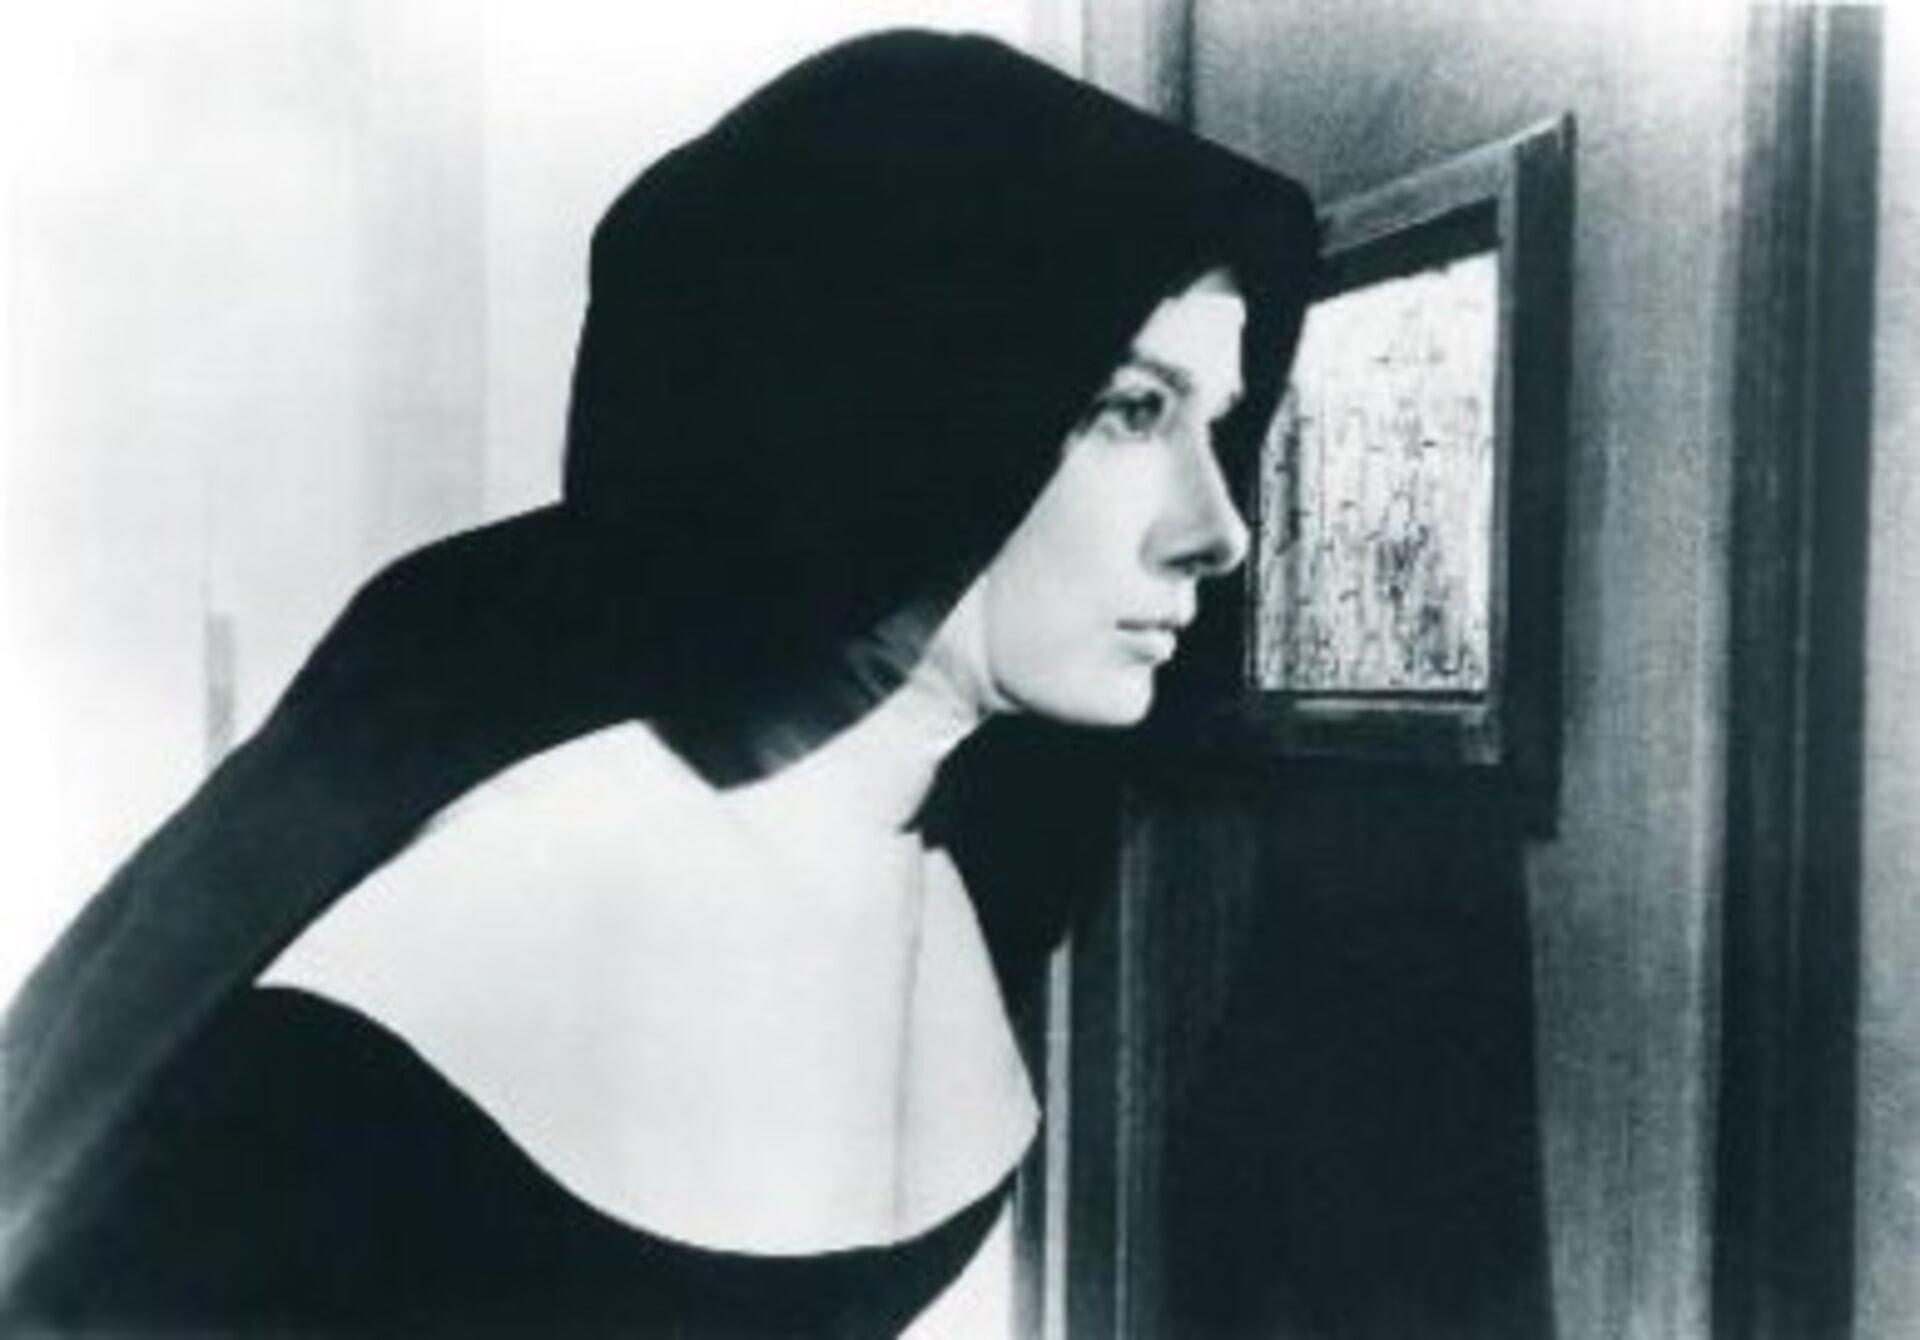 The Nun's Story - Image 1